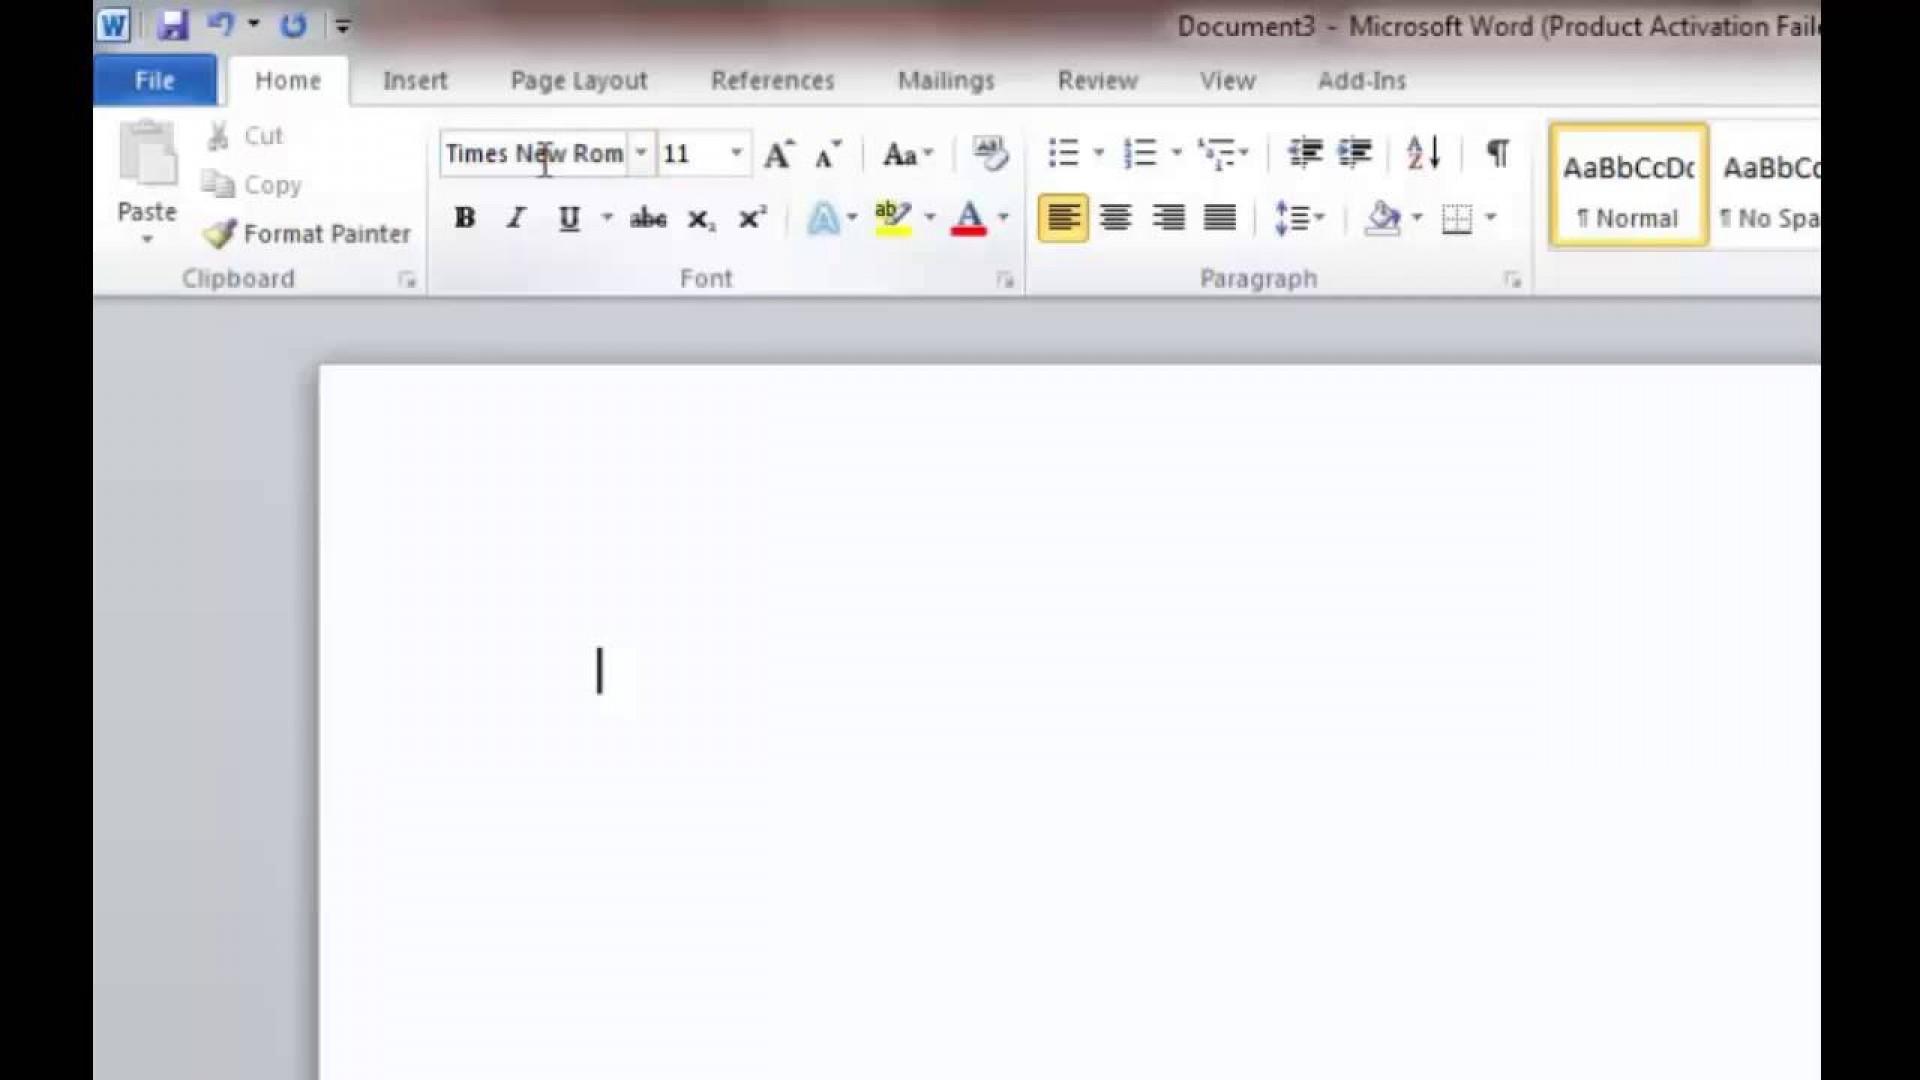 019 Essay Font Size Maxresdefault Stunning Format College Apa 1920